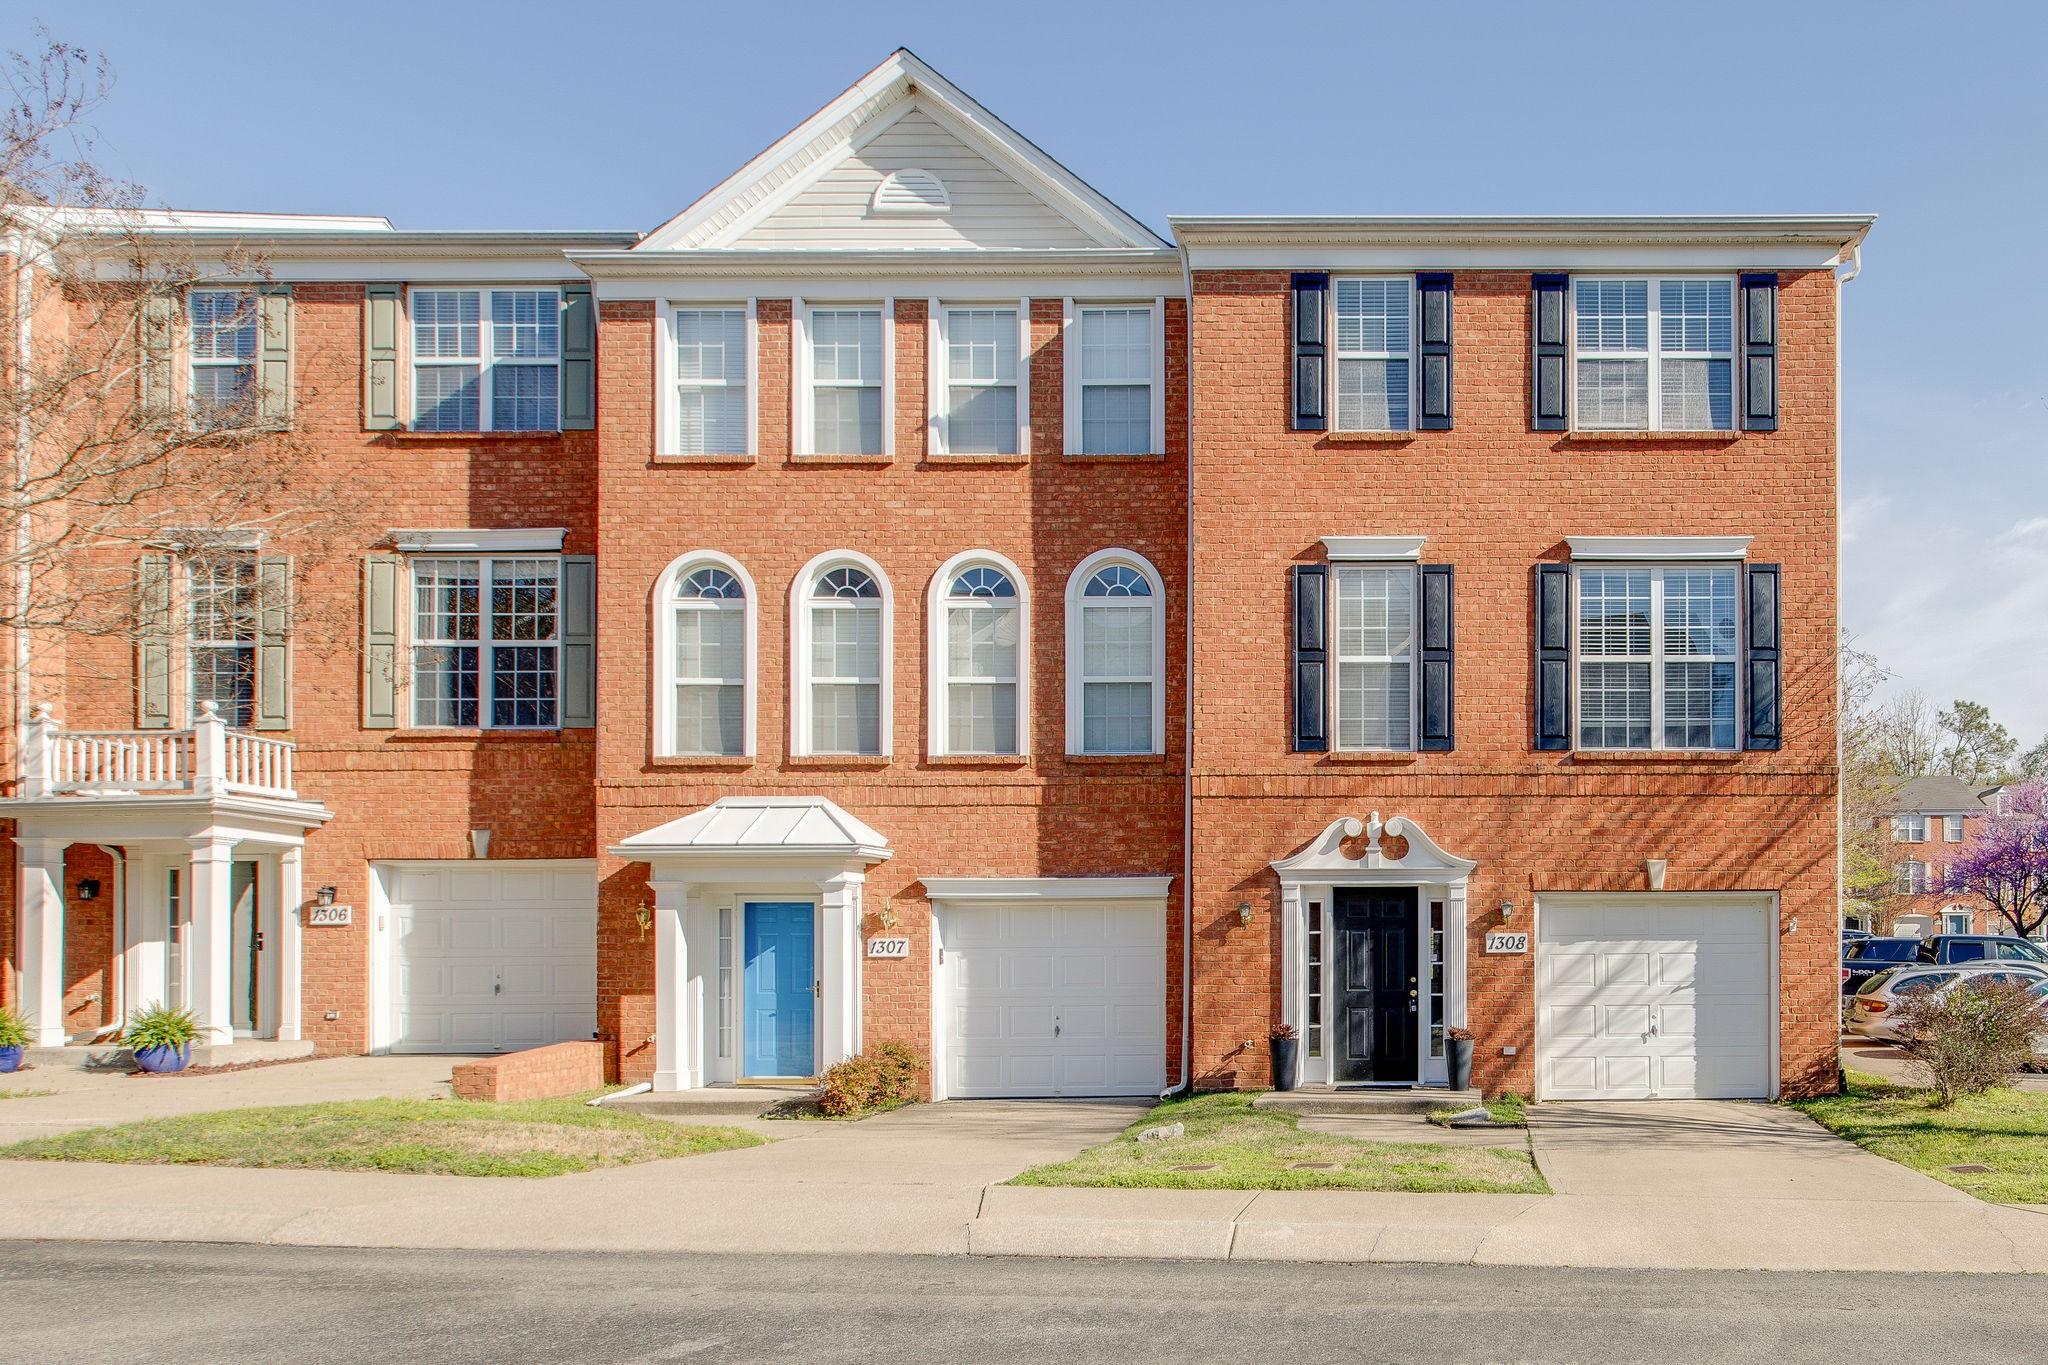 7252 Highway 70 S #1308, Nashville, TN 37221 - Nashville, TN real estate listing